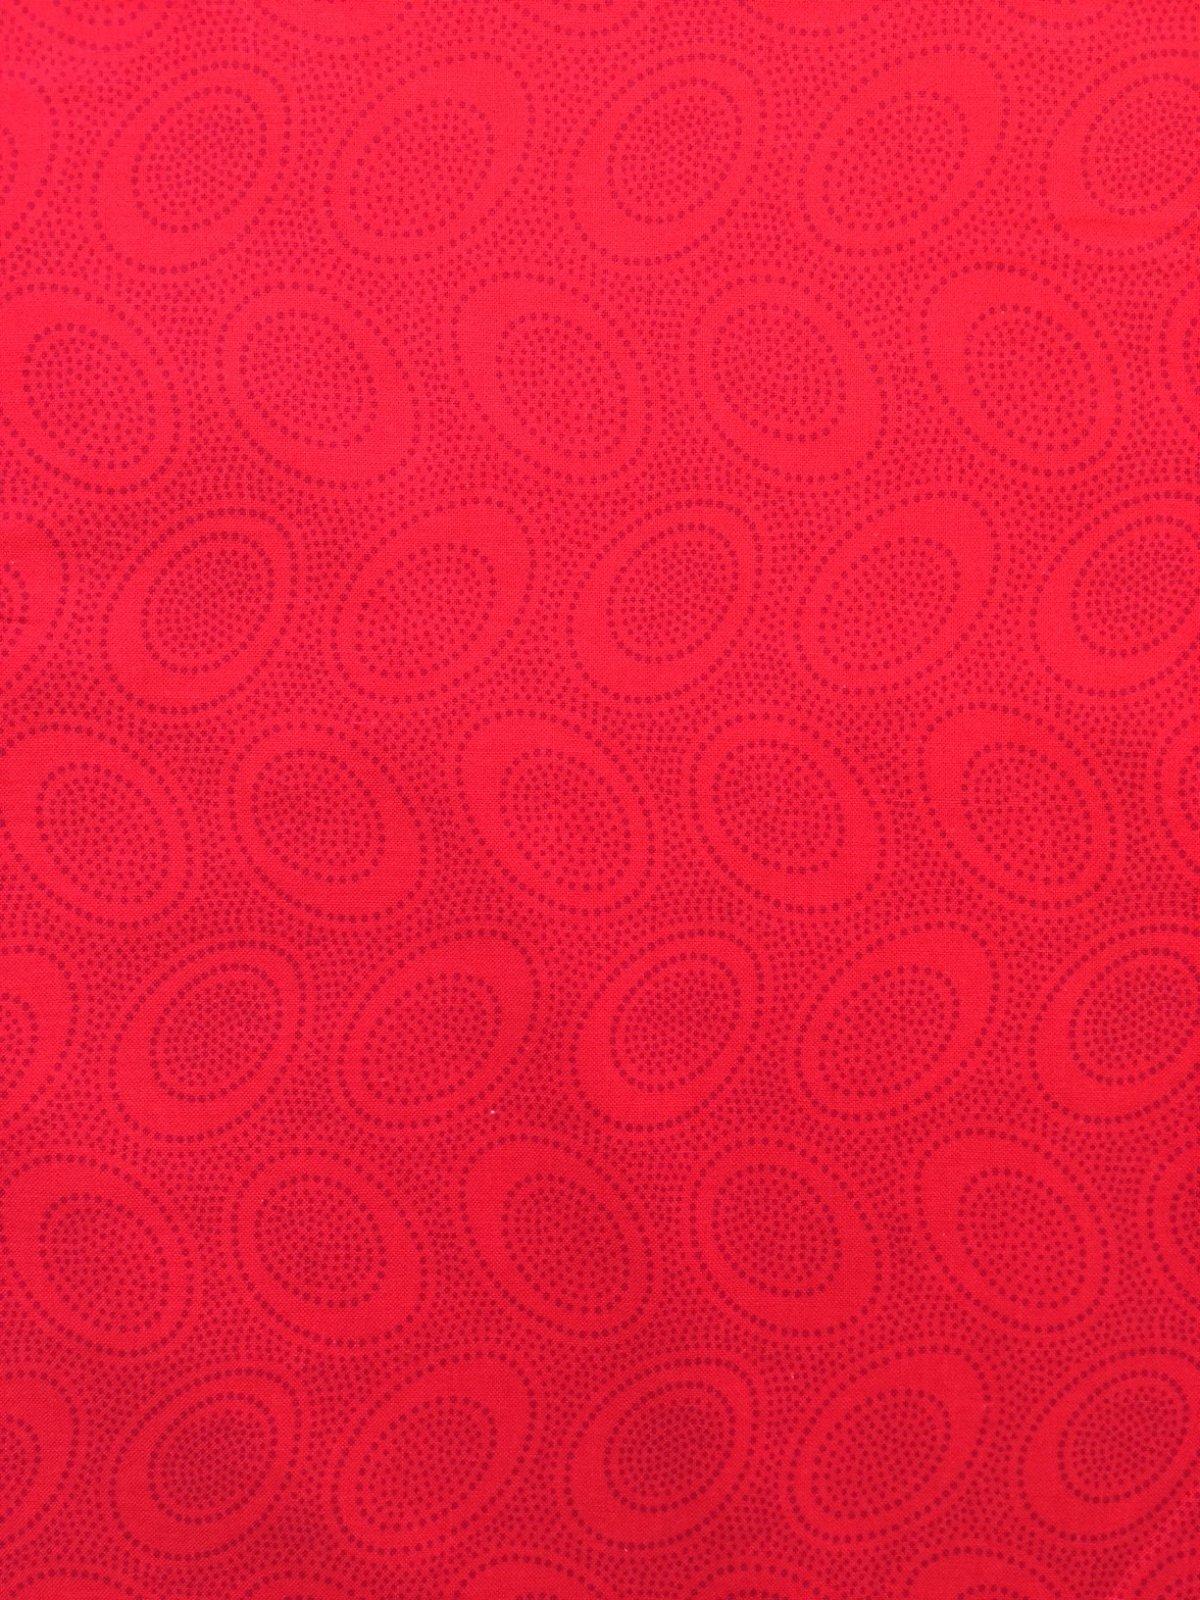 Aboriginal Dot in Red: Kaffe Fassett